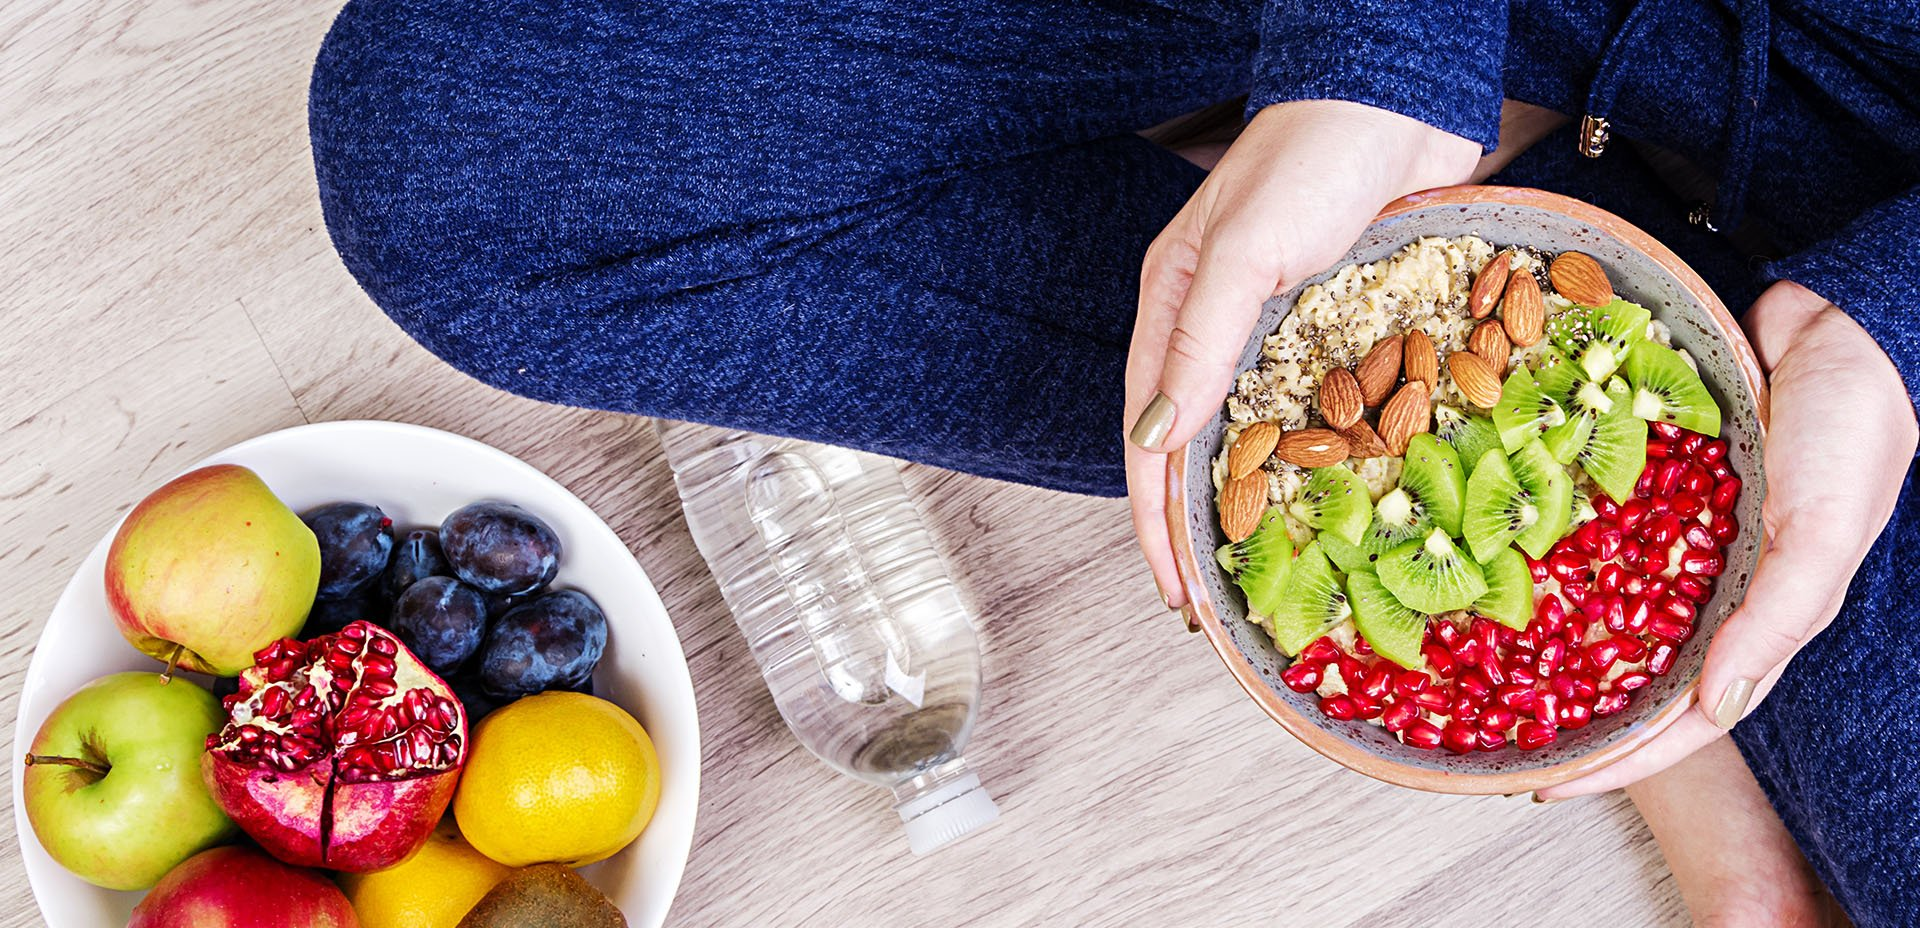 dieta vegana e sport?